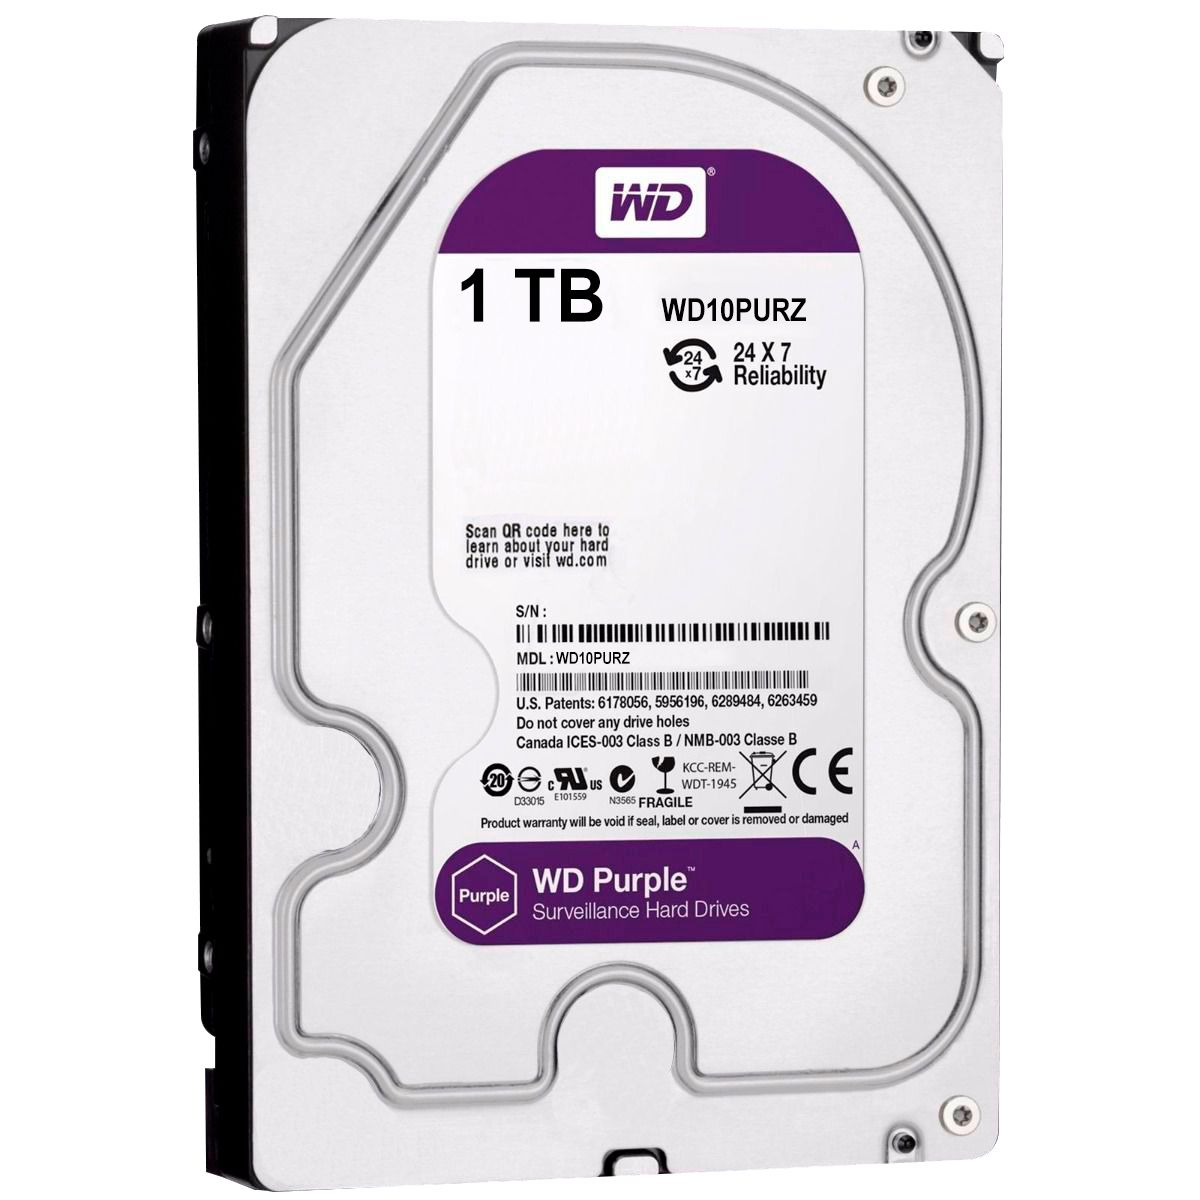 Kit 08 Câmeras IP HD 720p Intelbras VIP 1020 B G2 + NVD 1308 + HD WD Purple 1TB  - Tudo Forte